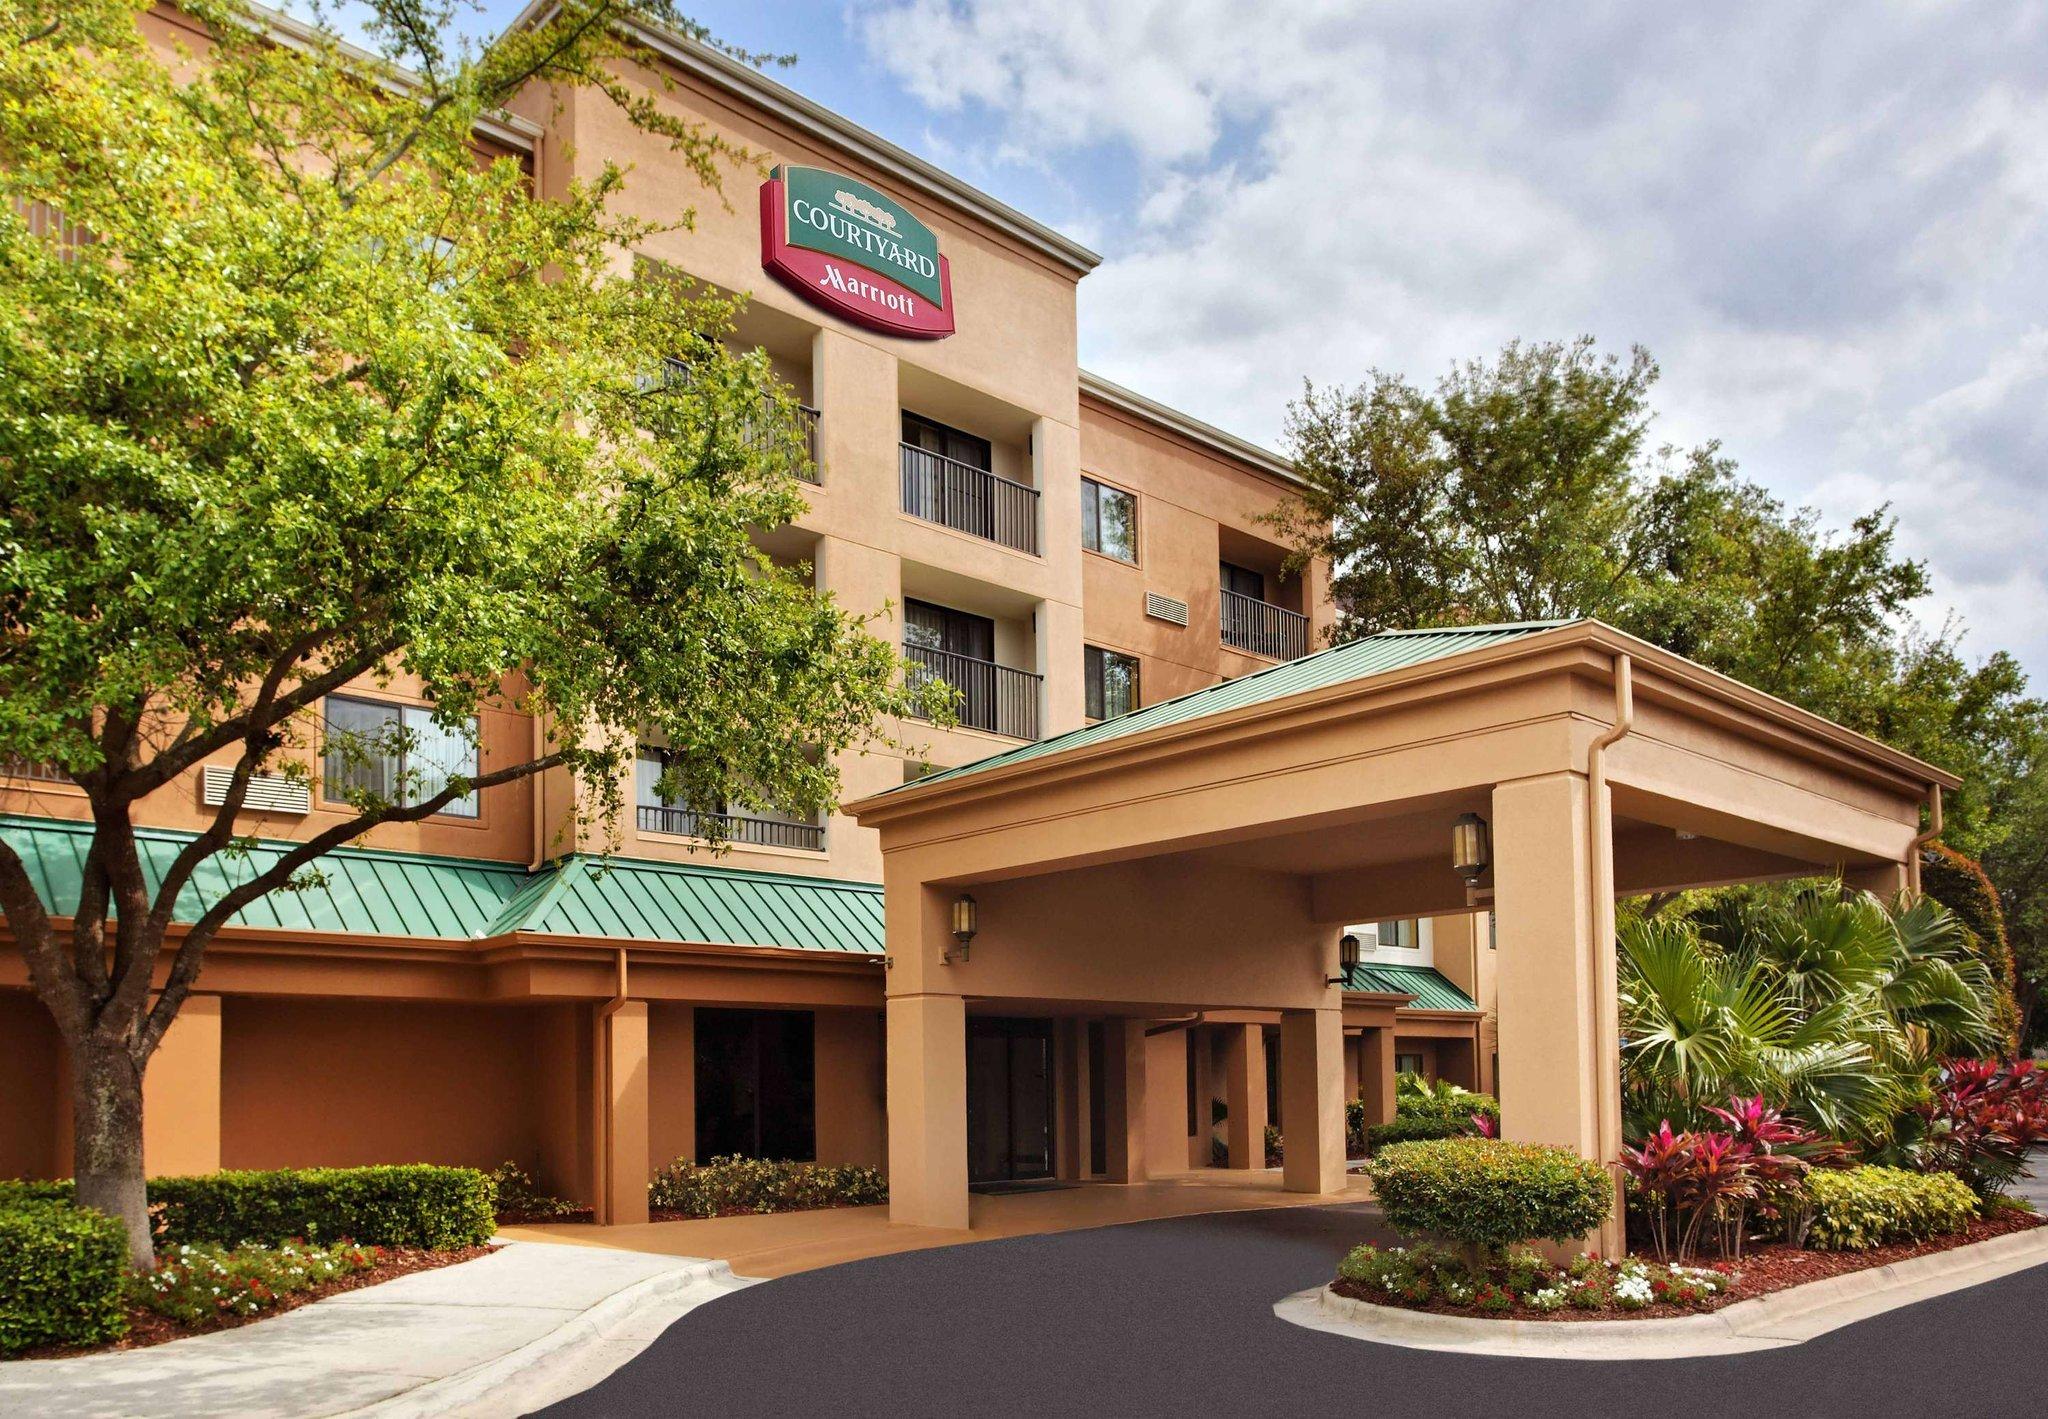 Courtyard Orlando Altamonte Springs/Maitland